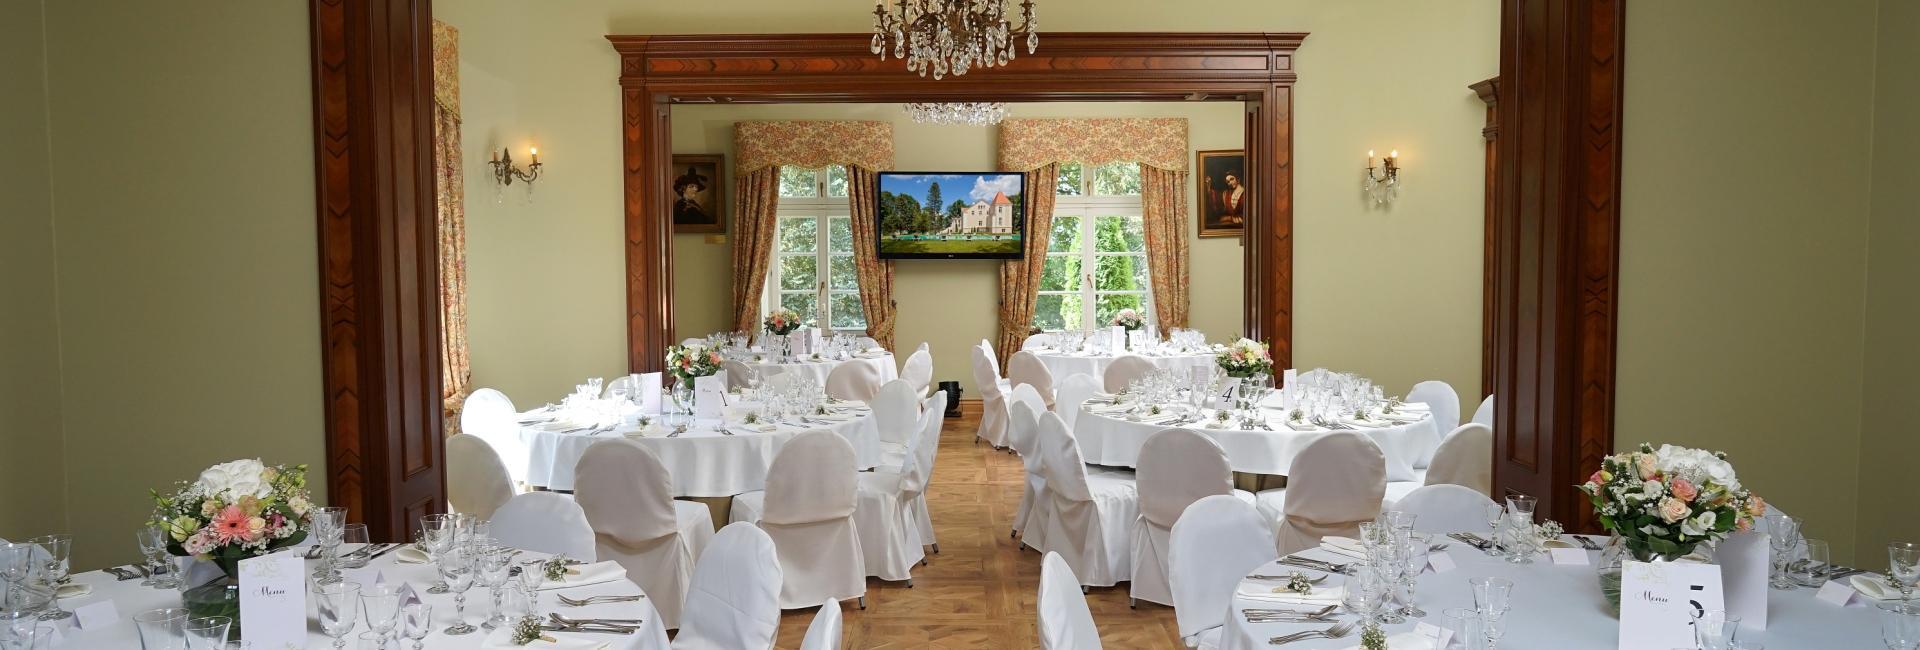 Wedding at Pacoltowo Palace, Poland